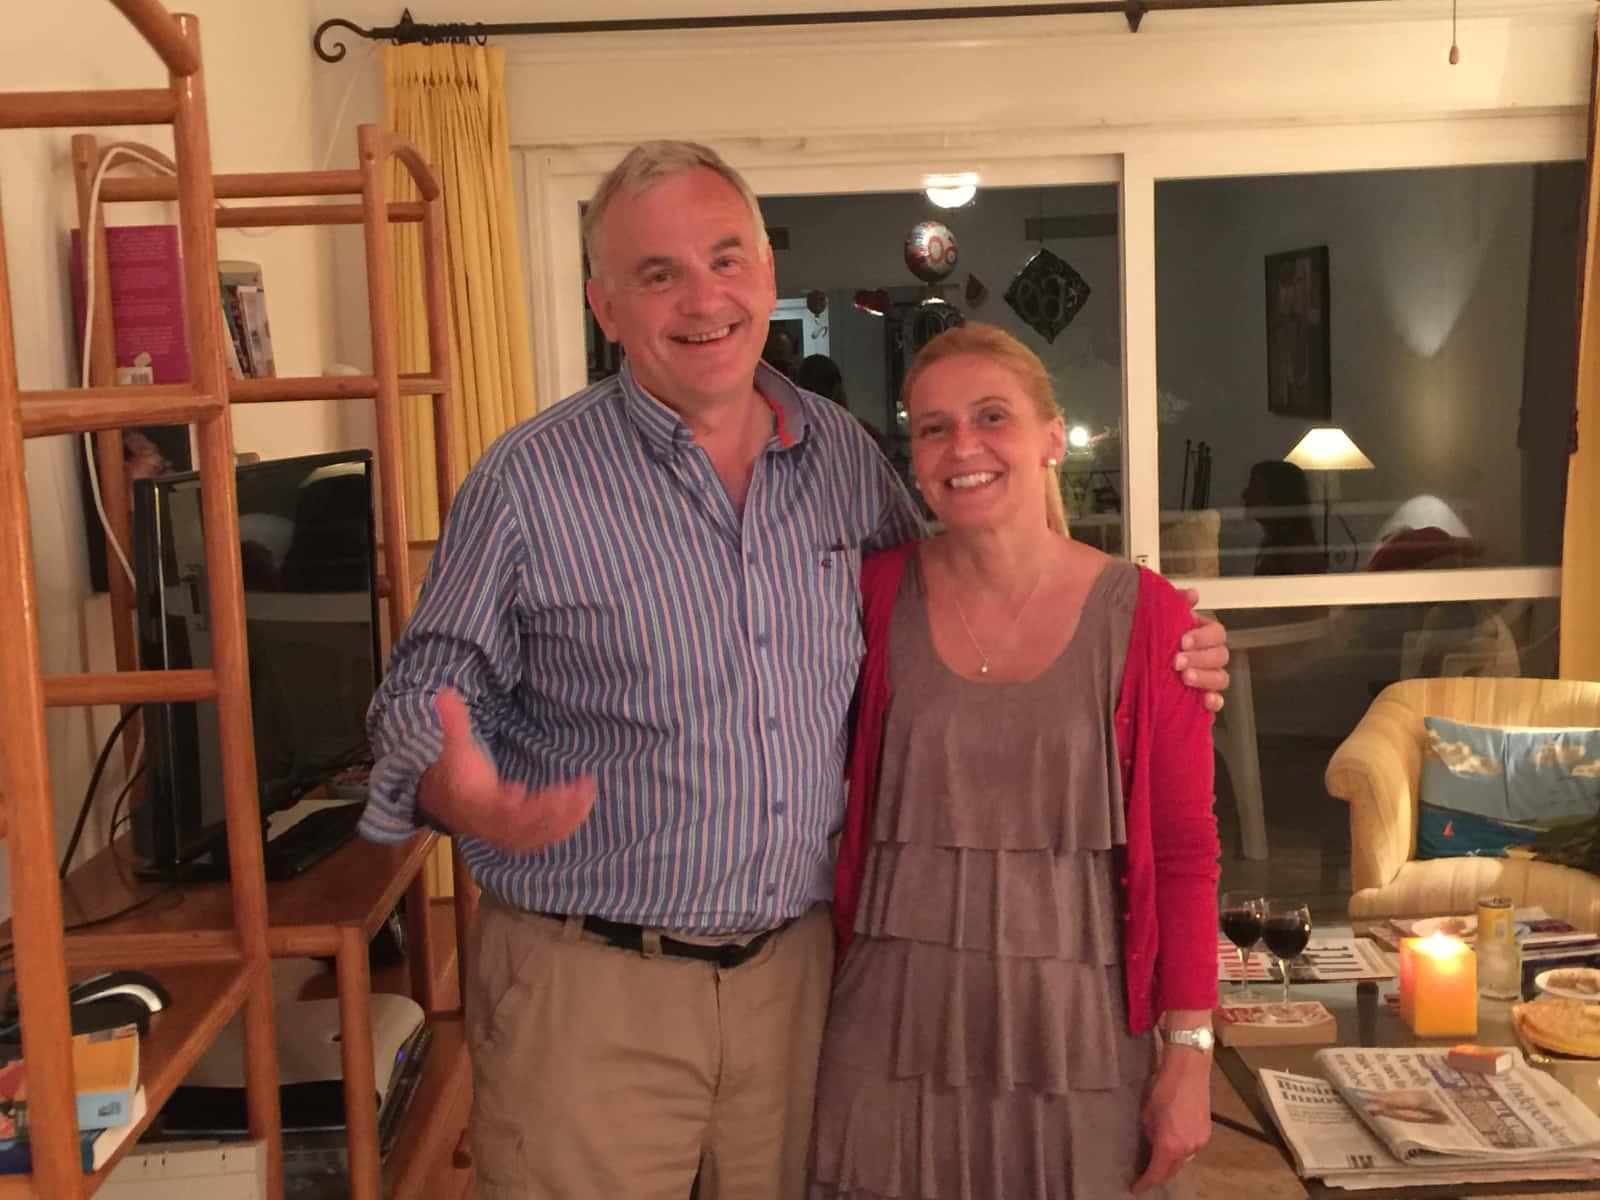 Uta johanne & Bryan from Wicklow, Ireland